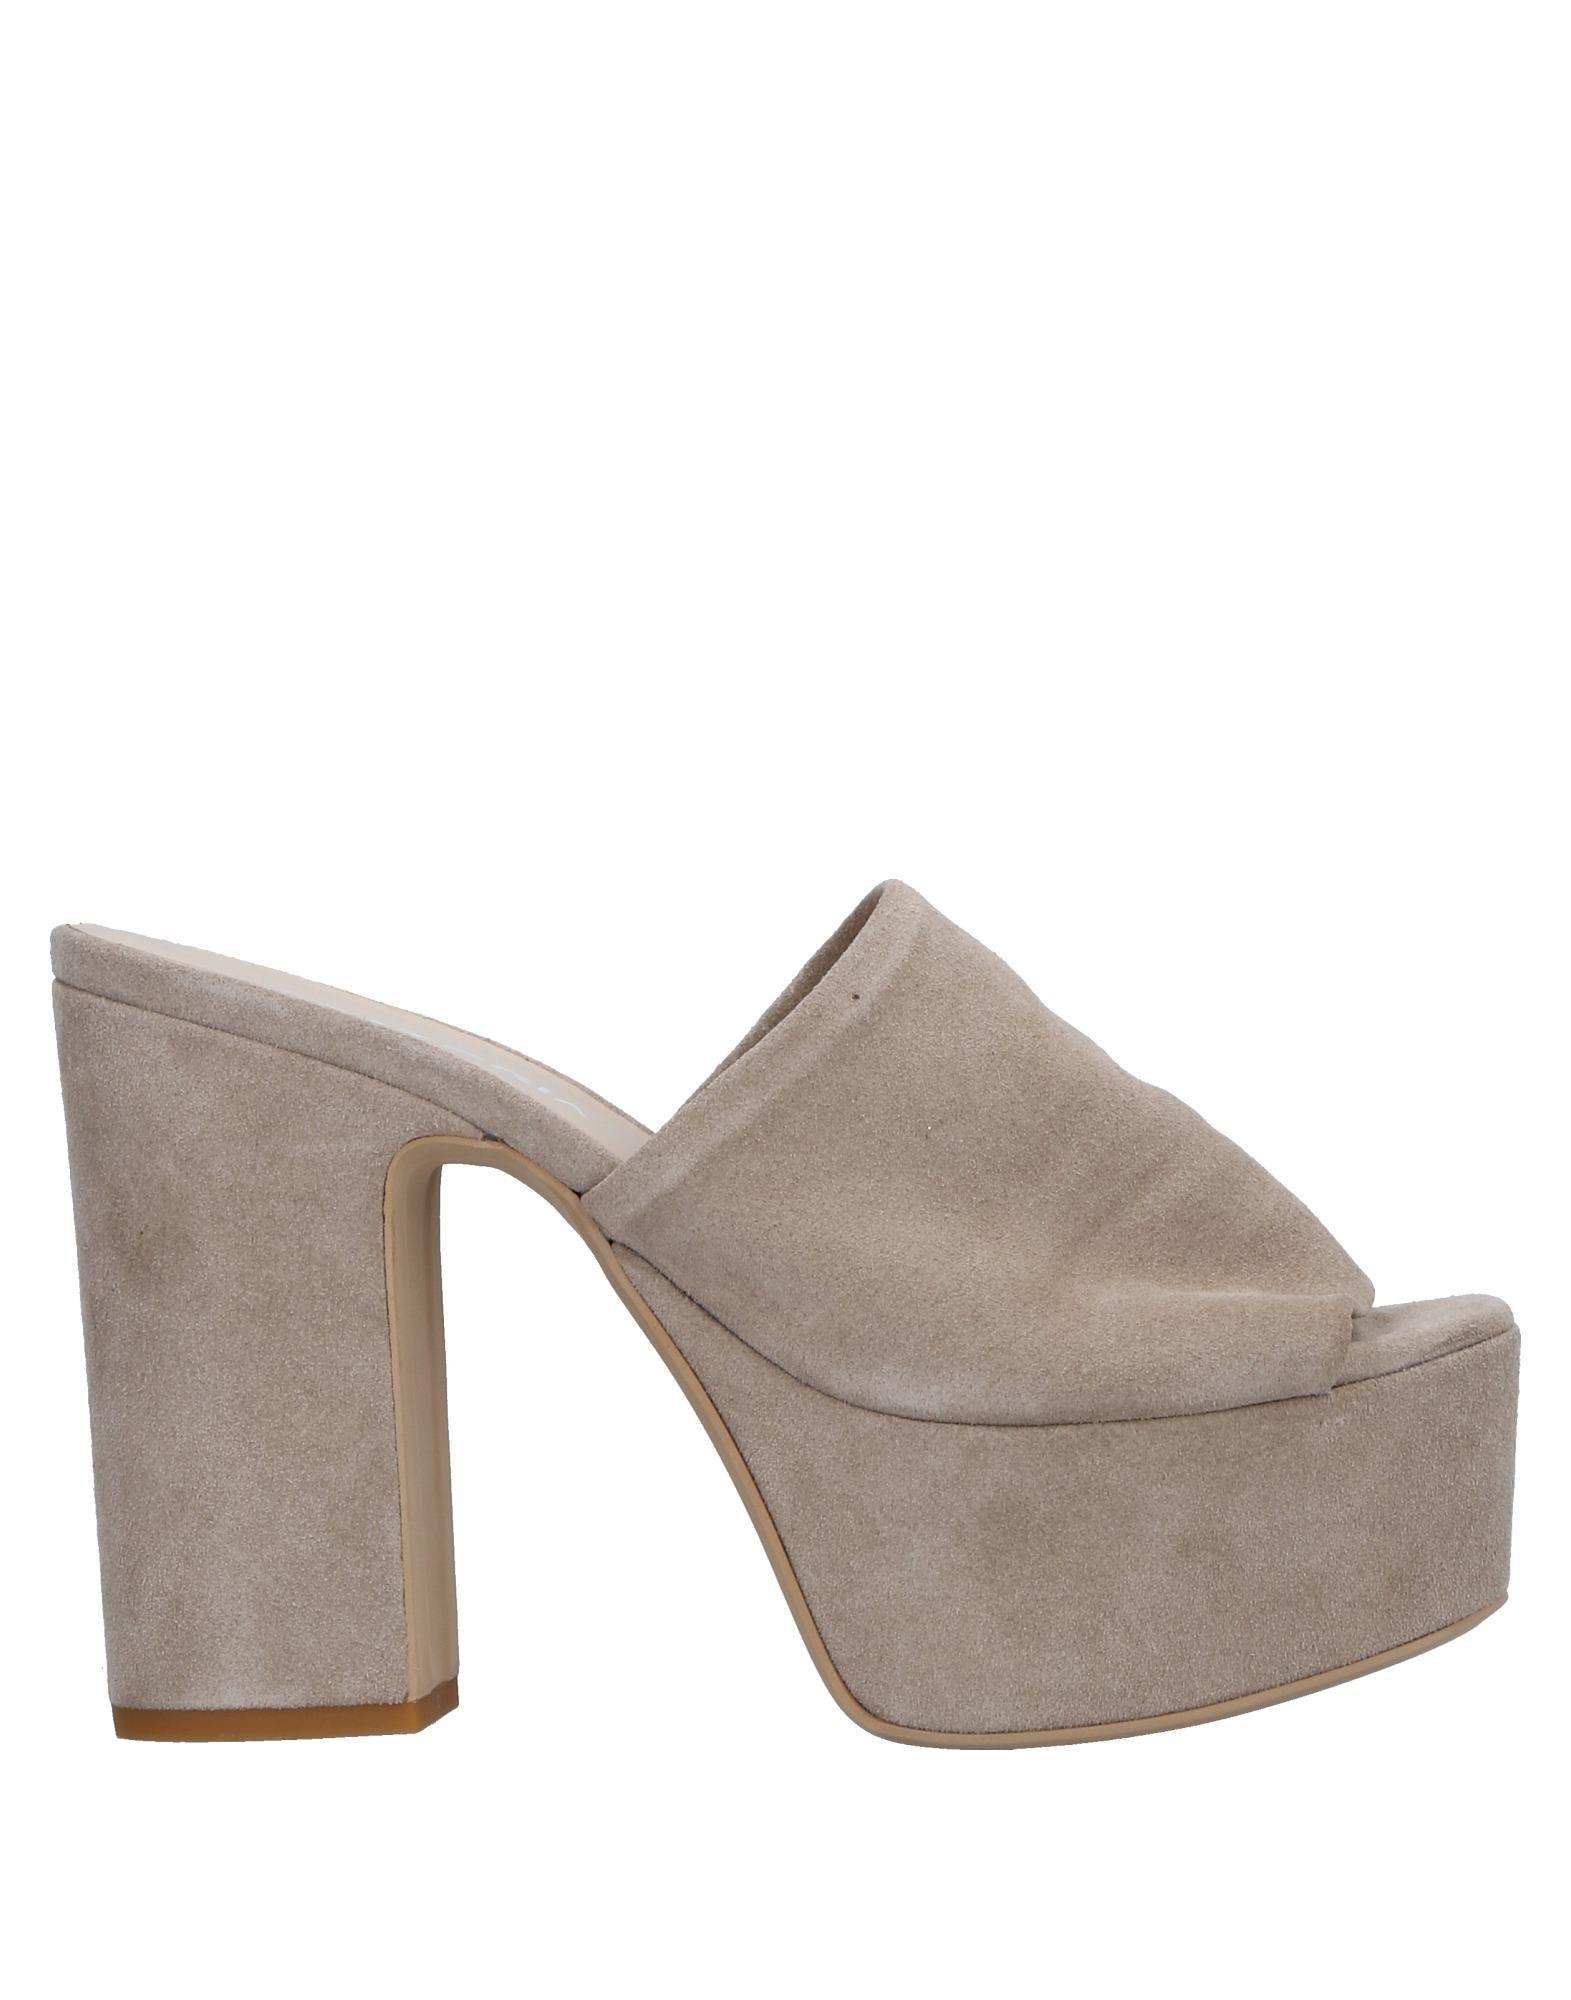 en en en sandales - femmes en sandales en ligne le royaume - uni - 11531434hk 751dd0